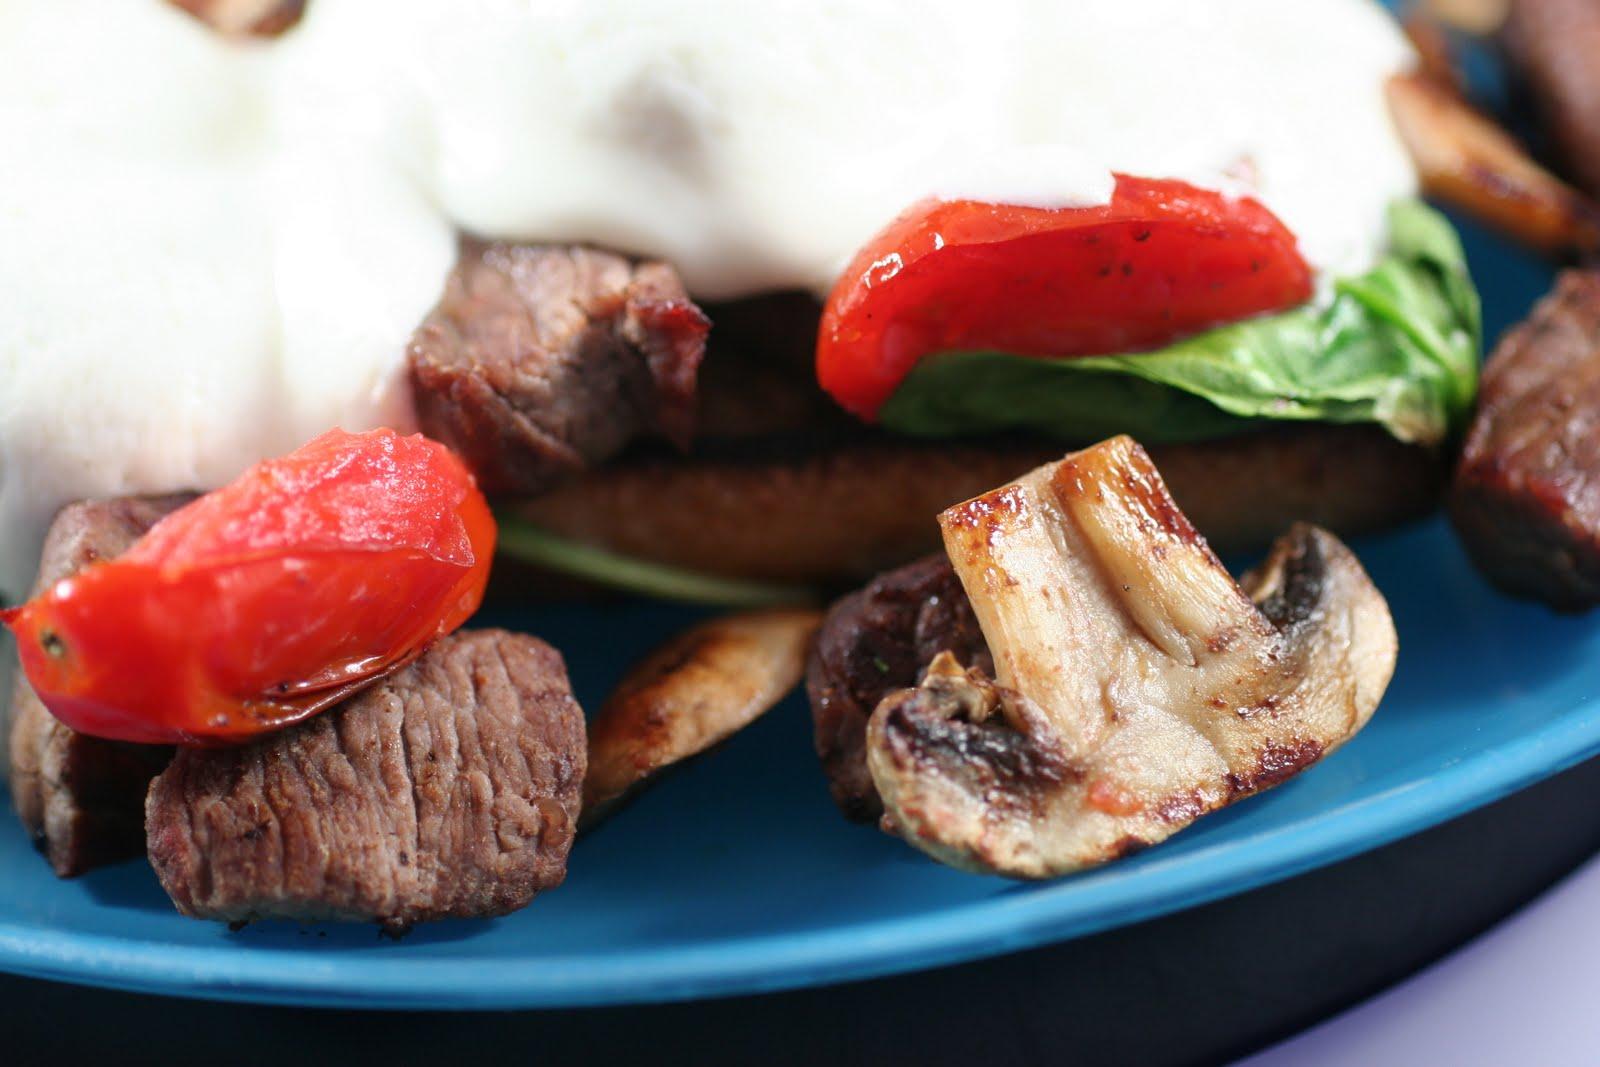 Crostini and Chianti: Grilled Steak Sandwich